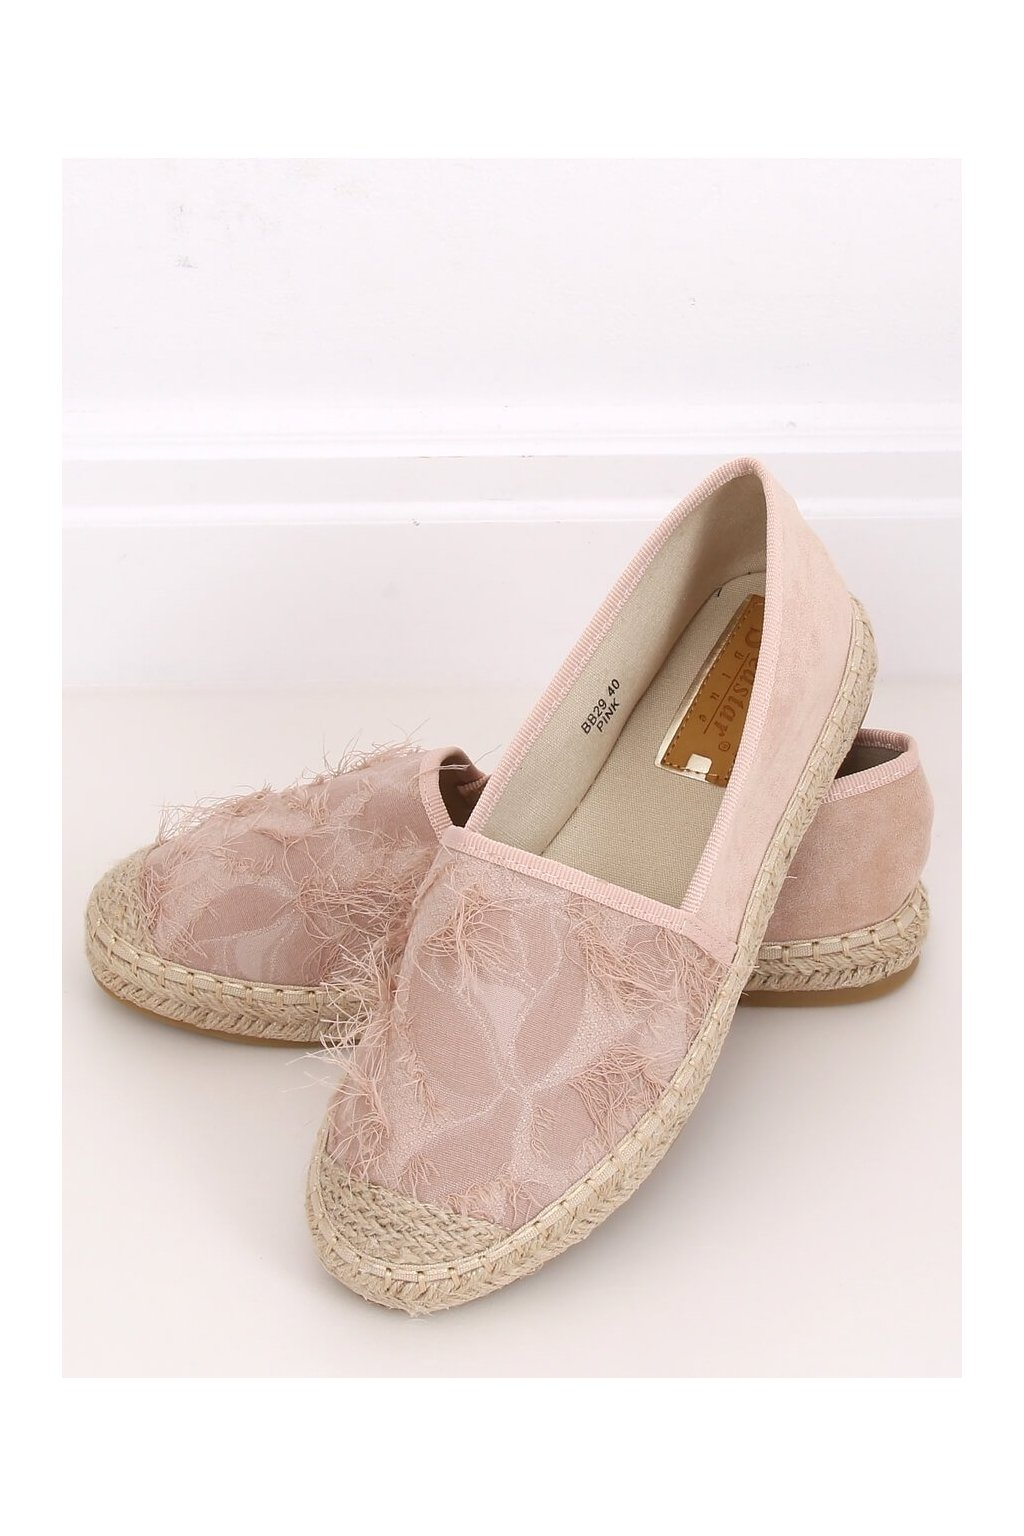 Dámske sandále ružové na plochom podpätku BB29